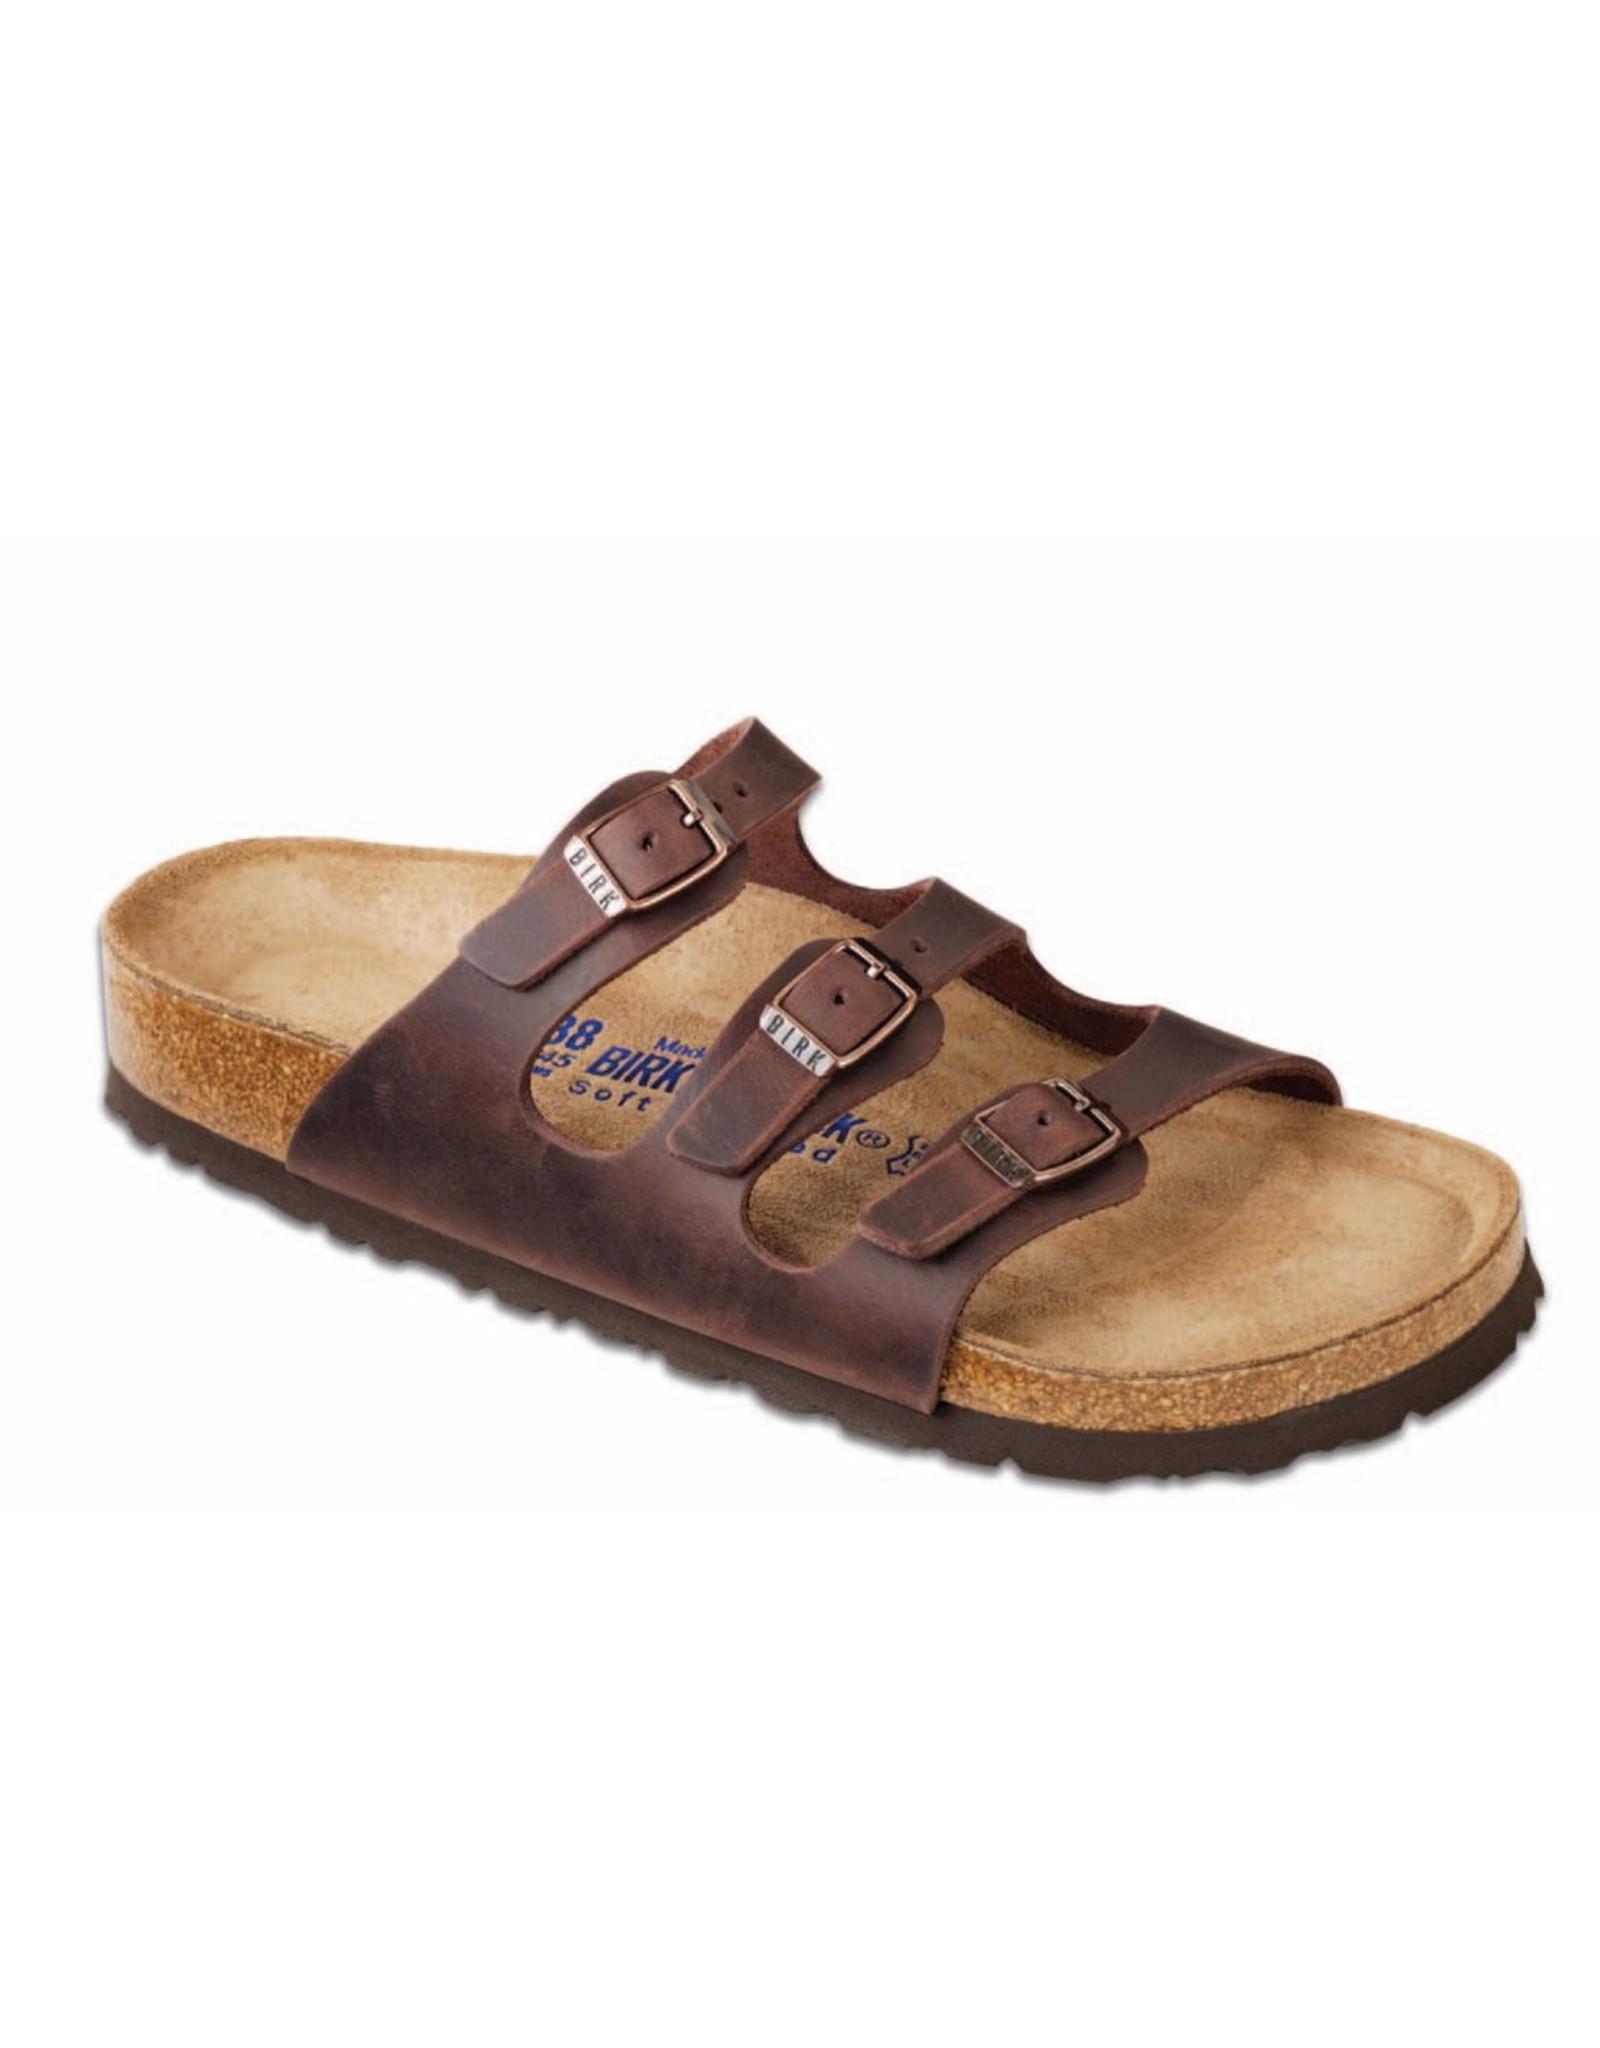 Birkenstock Soft Footbed Habana Oiled Leather Florida